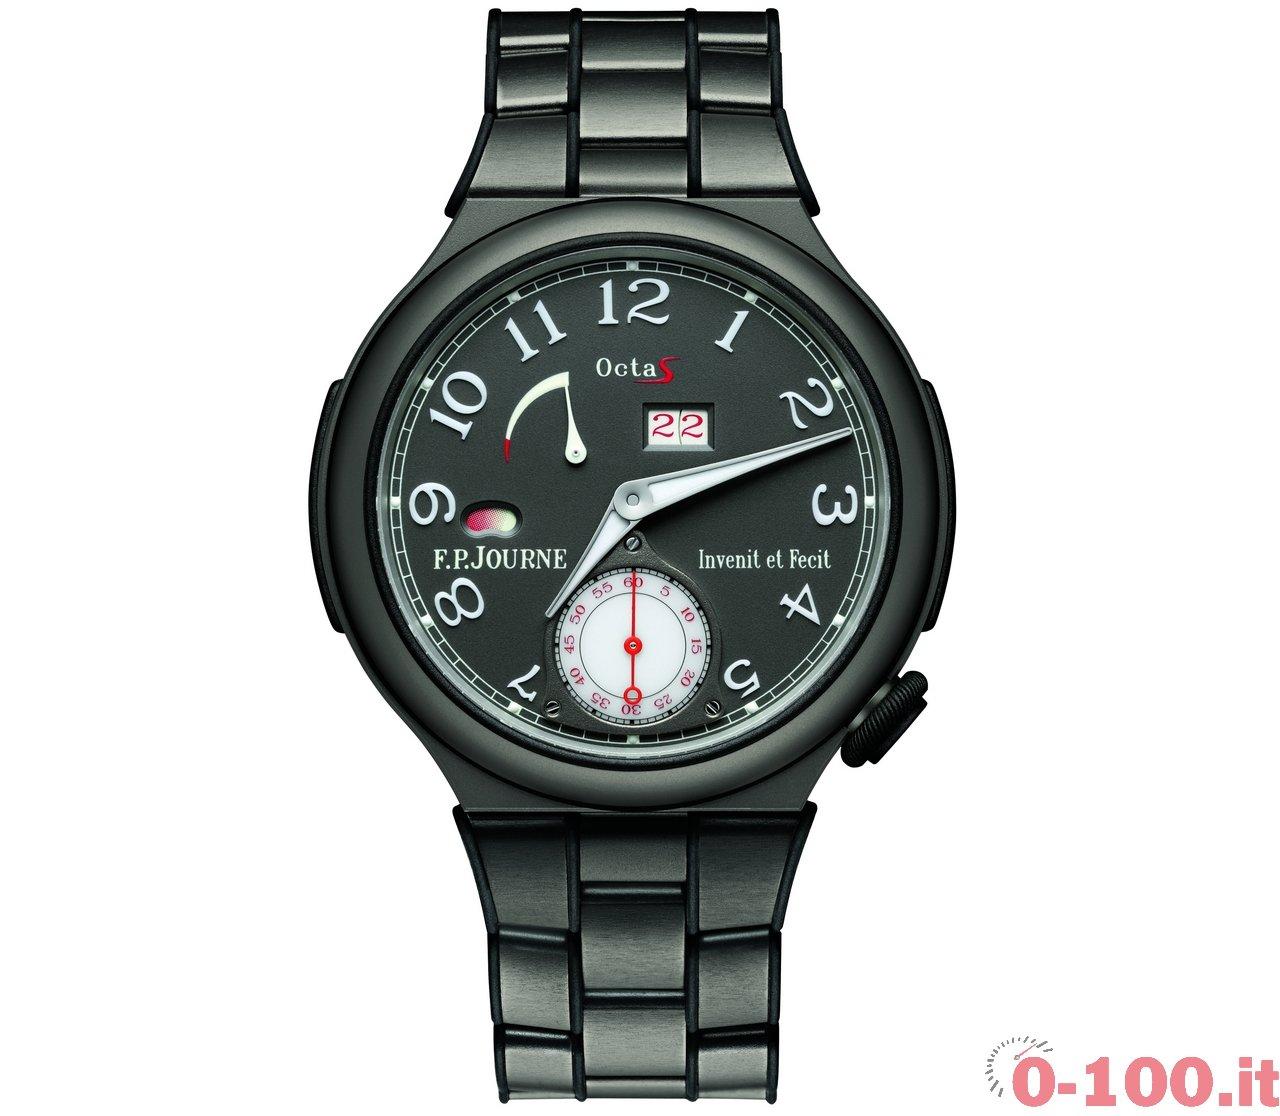 f-p-journe-octa-sport-titanium-prezzo-price-0-100_1